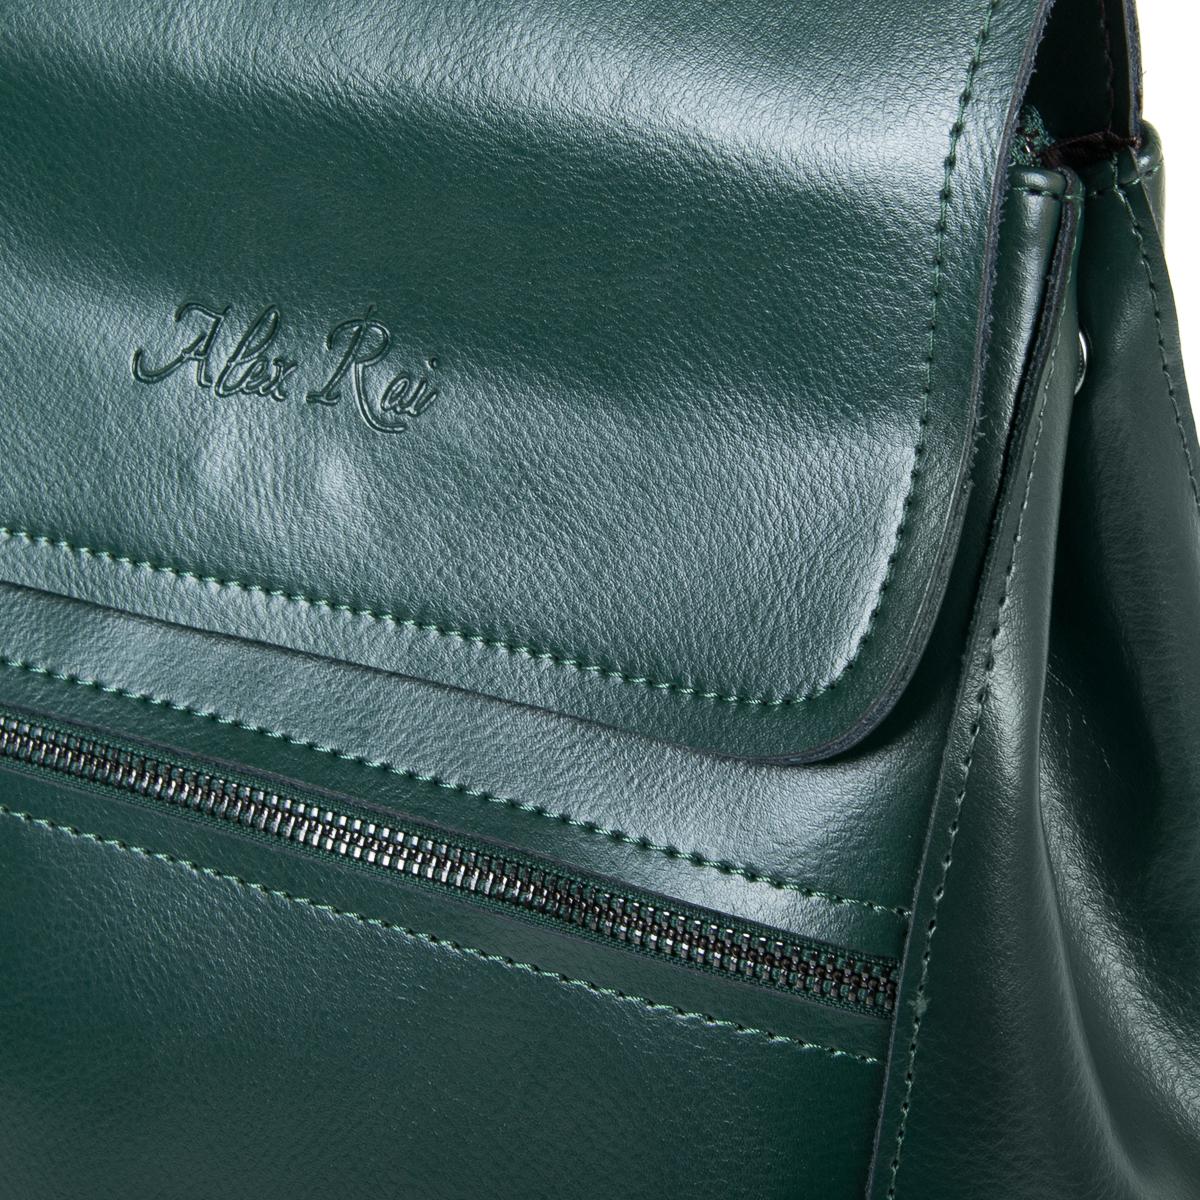 Сумка Женская Рюкзак кожа ALEX RAI 9-01 1005 green - фото 3